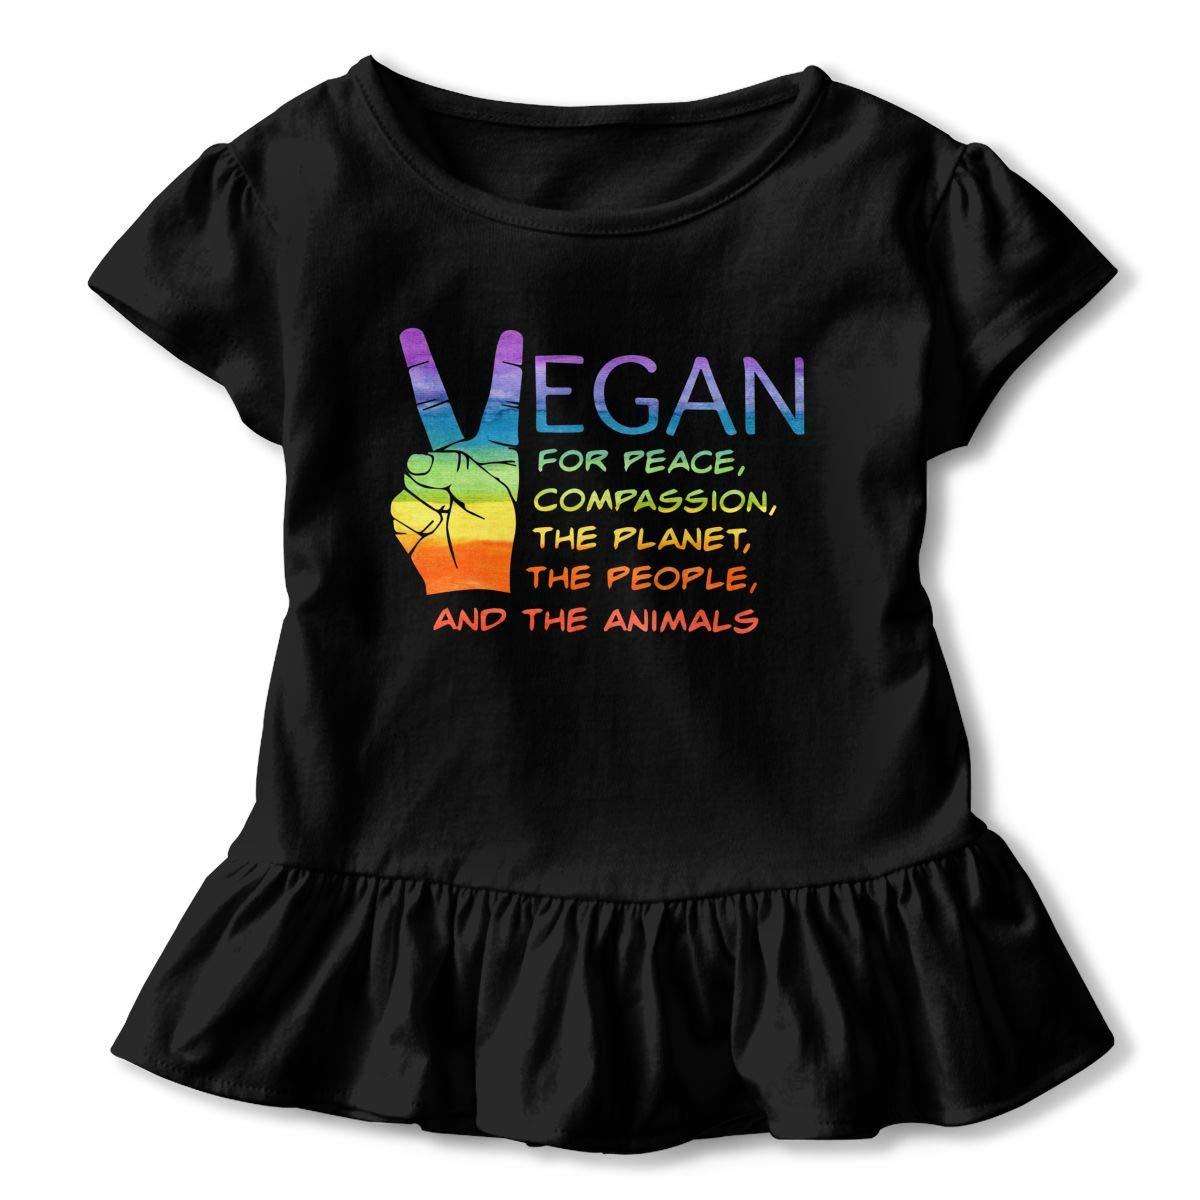 Cheng Jian Bo Vegan Compassion Animals Toddler Girls T Shirt Kids Cotton Short Sleeve Ruffle Tee